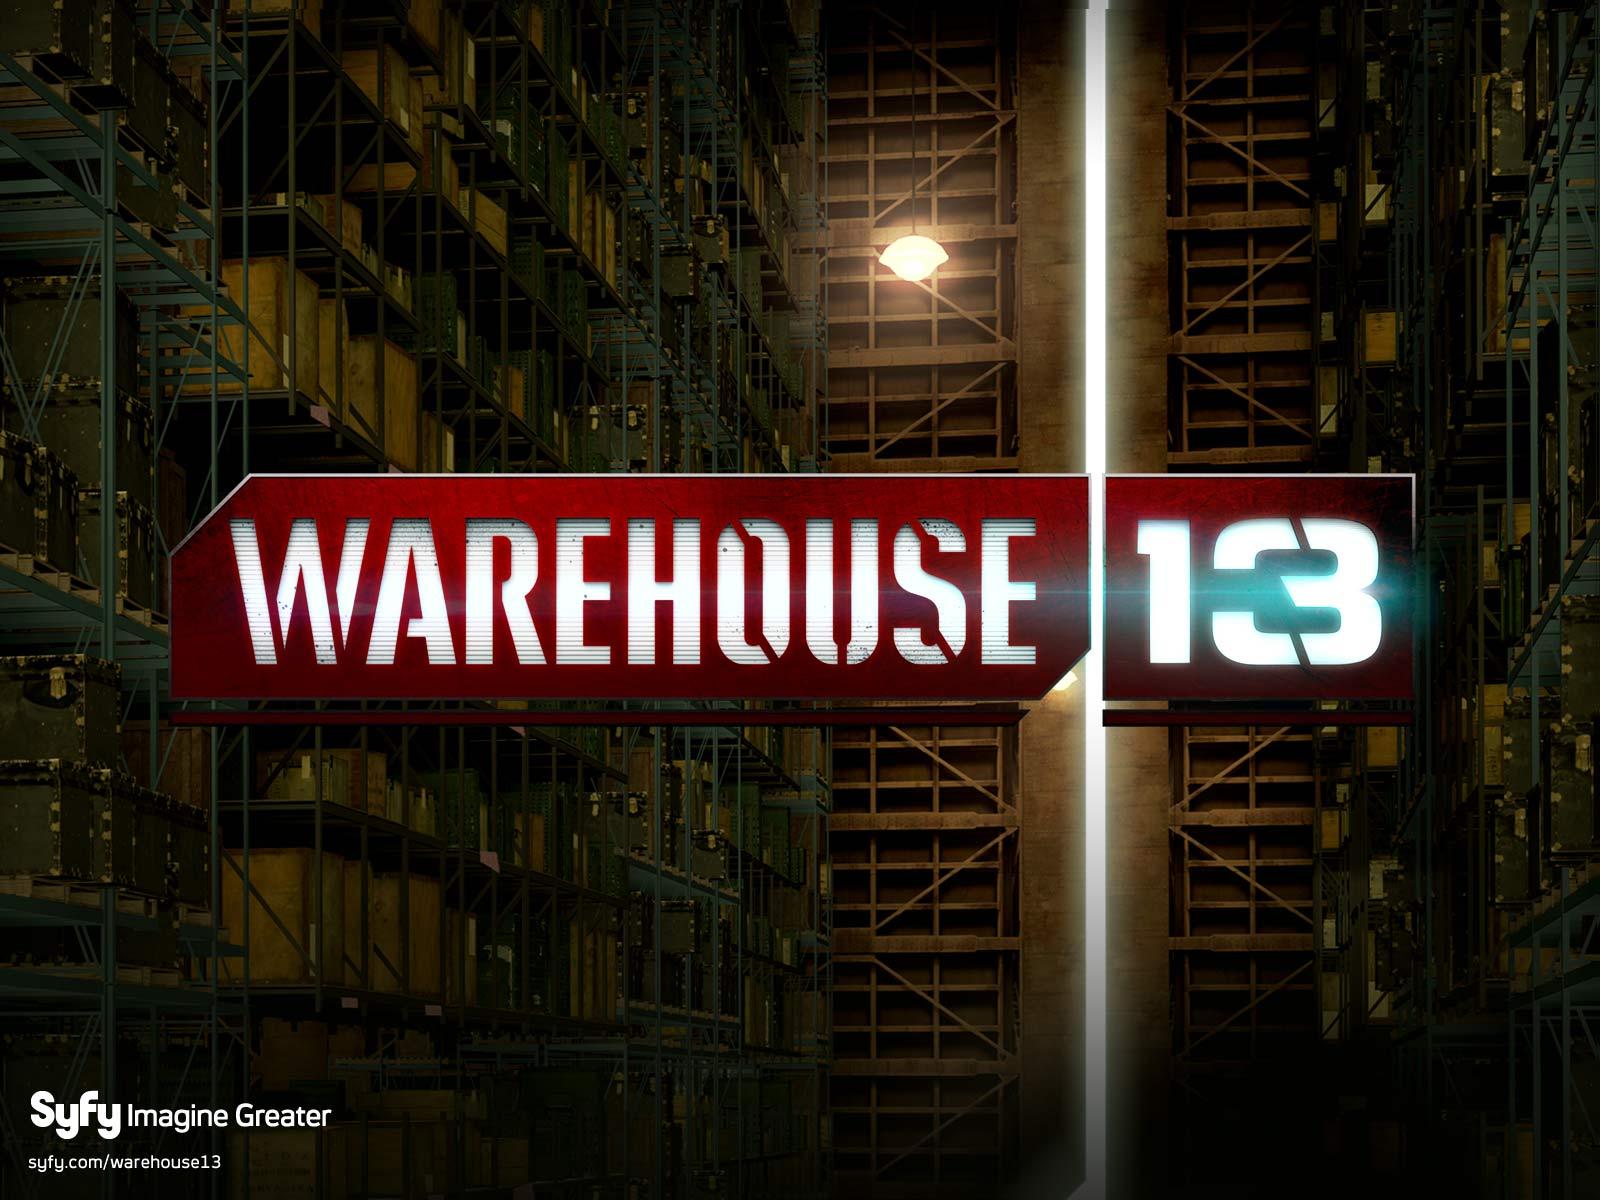 Warehouse 13 Renewed for Final Season